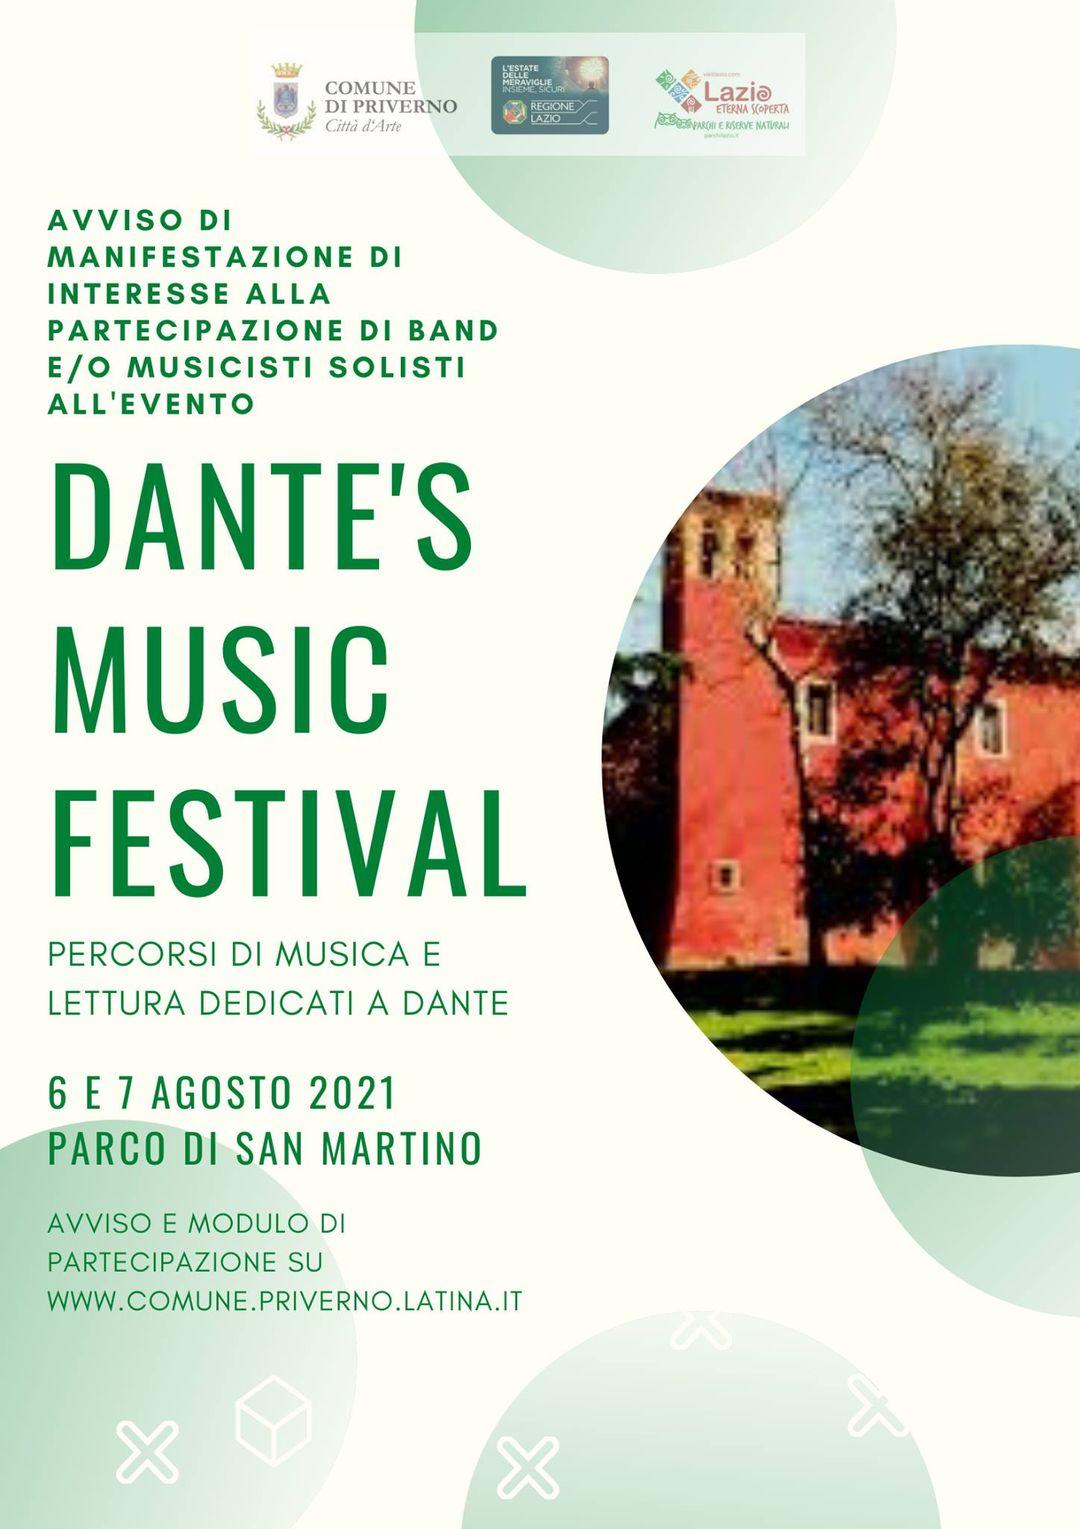 dante-music-festival